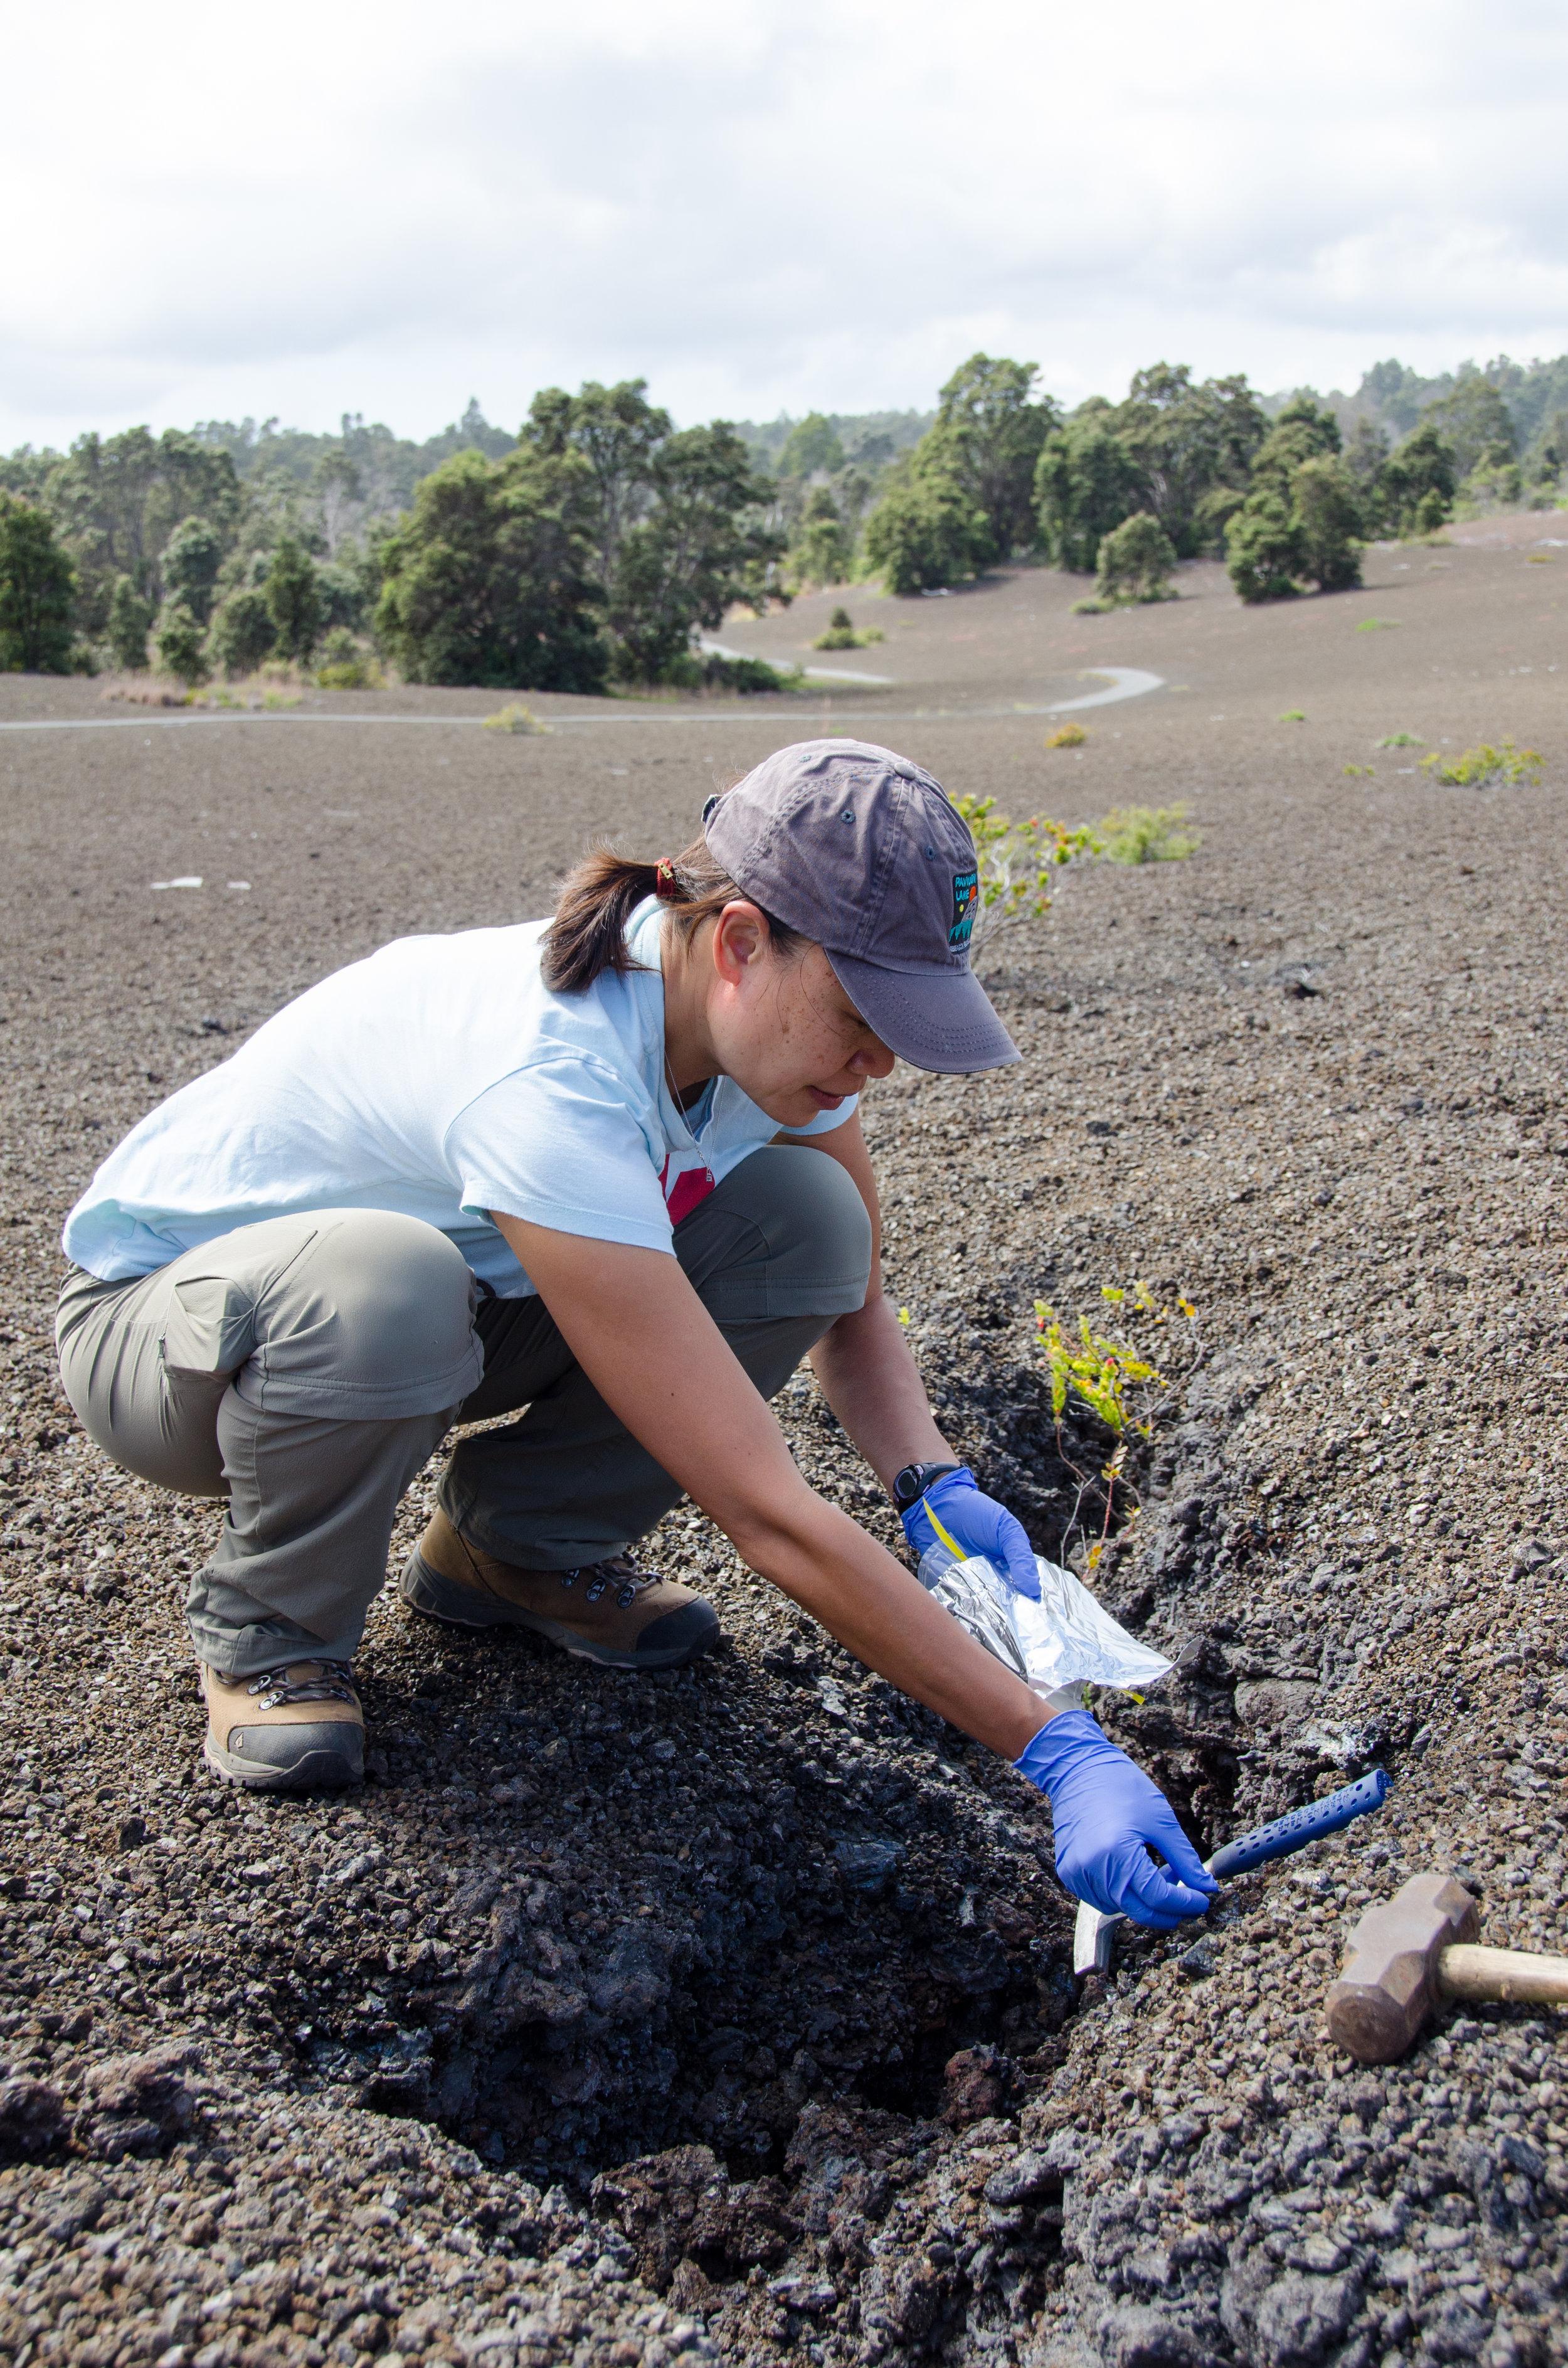 Field sampling in the Kilauea Iki region, 2015